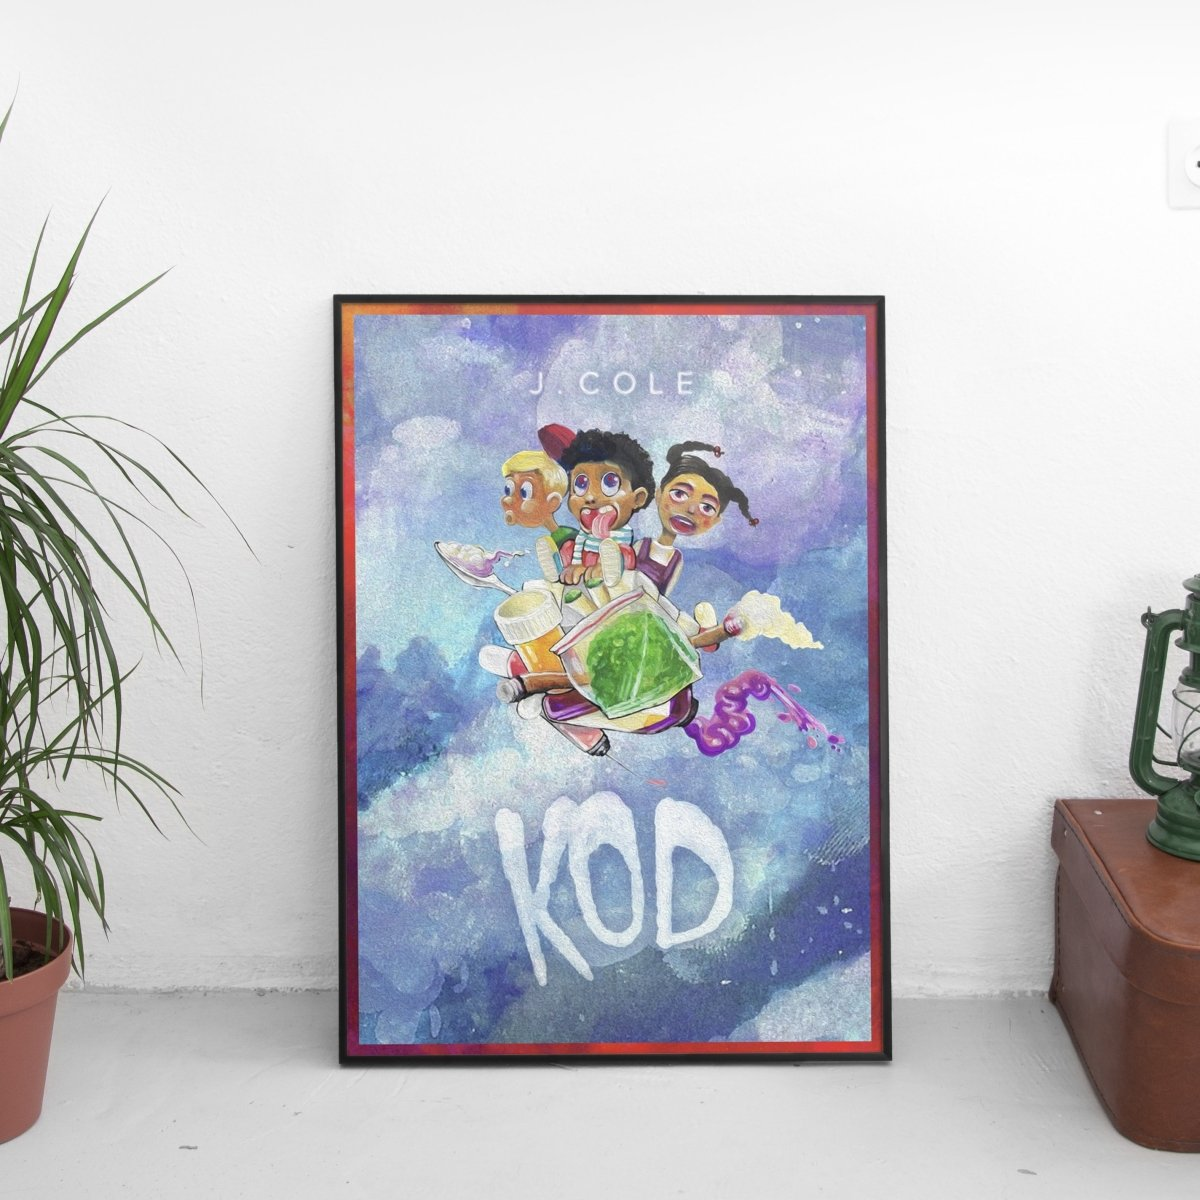 J Cole - KOD Kids Poster